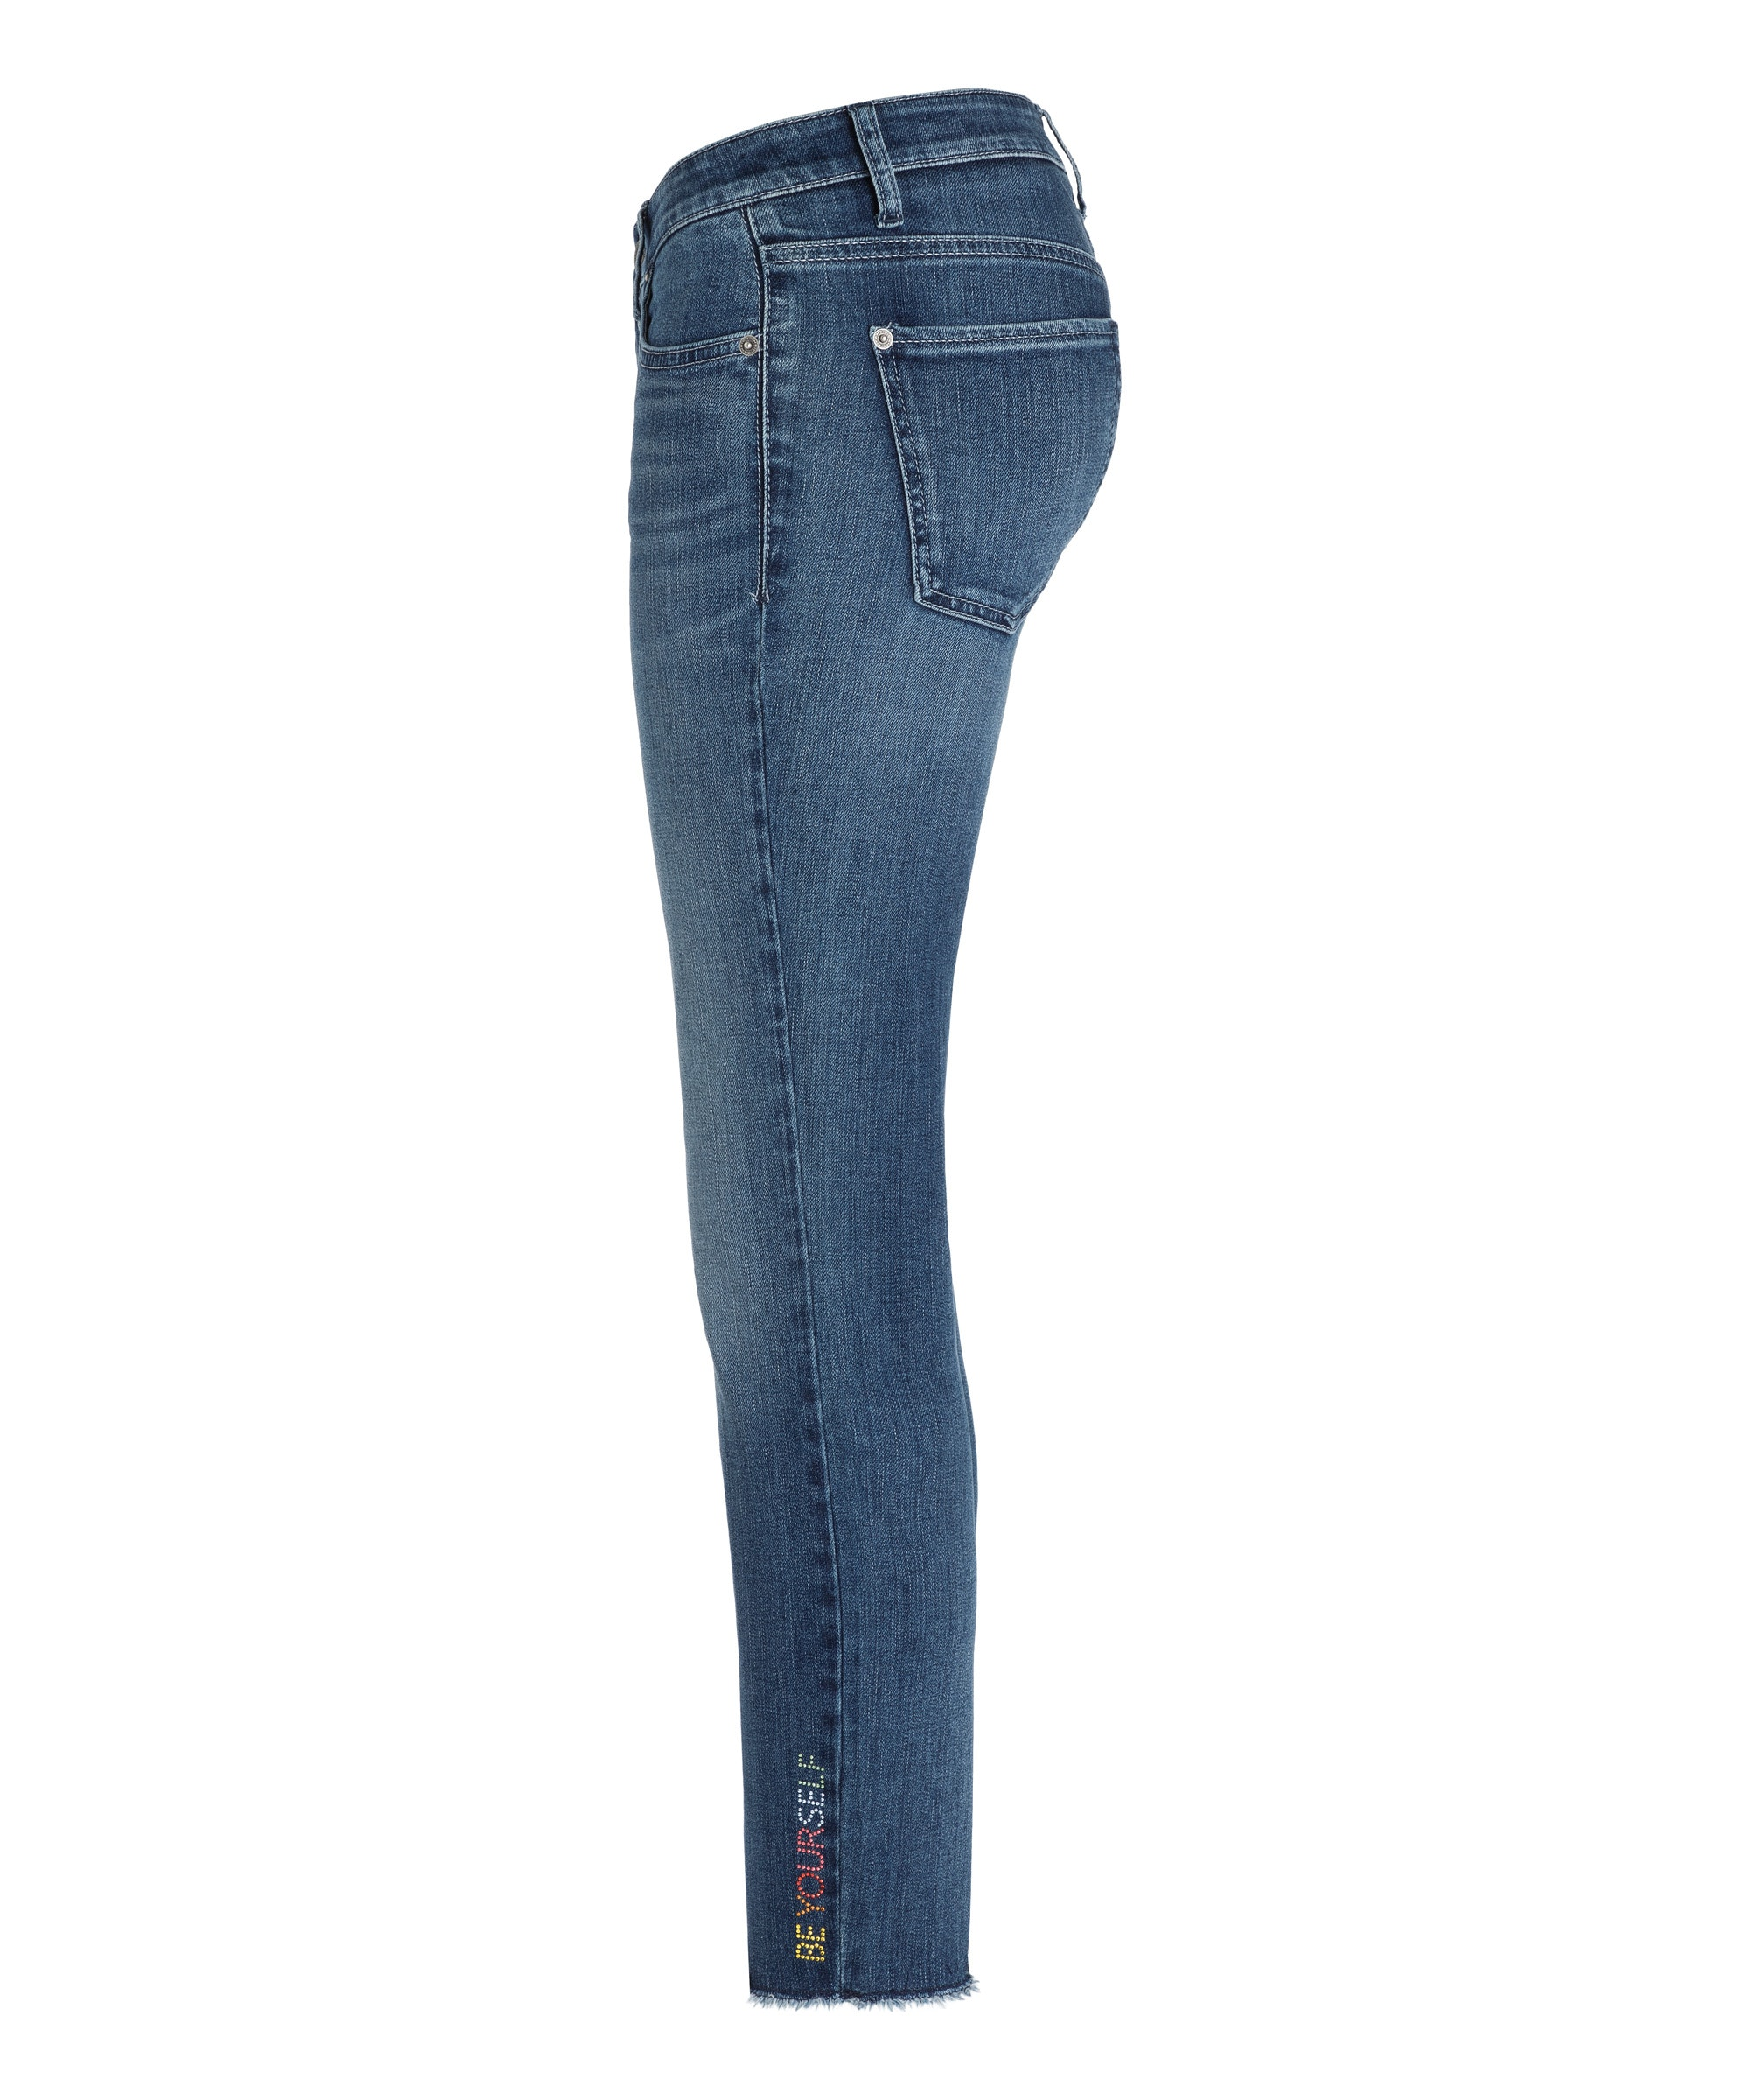 Cambio Jeans Liu short DARK PEPPY USED FRINGED HEM